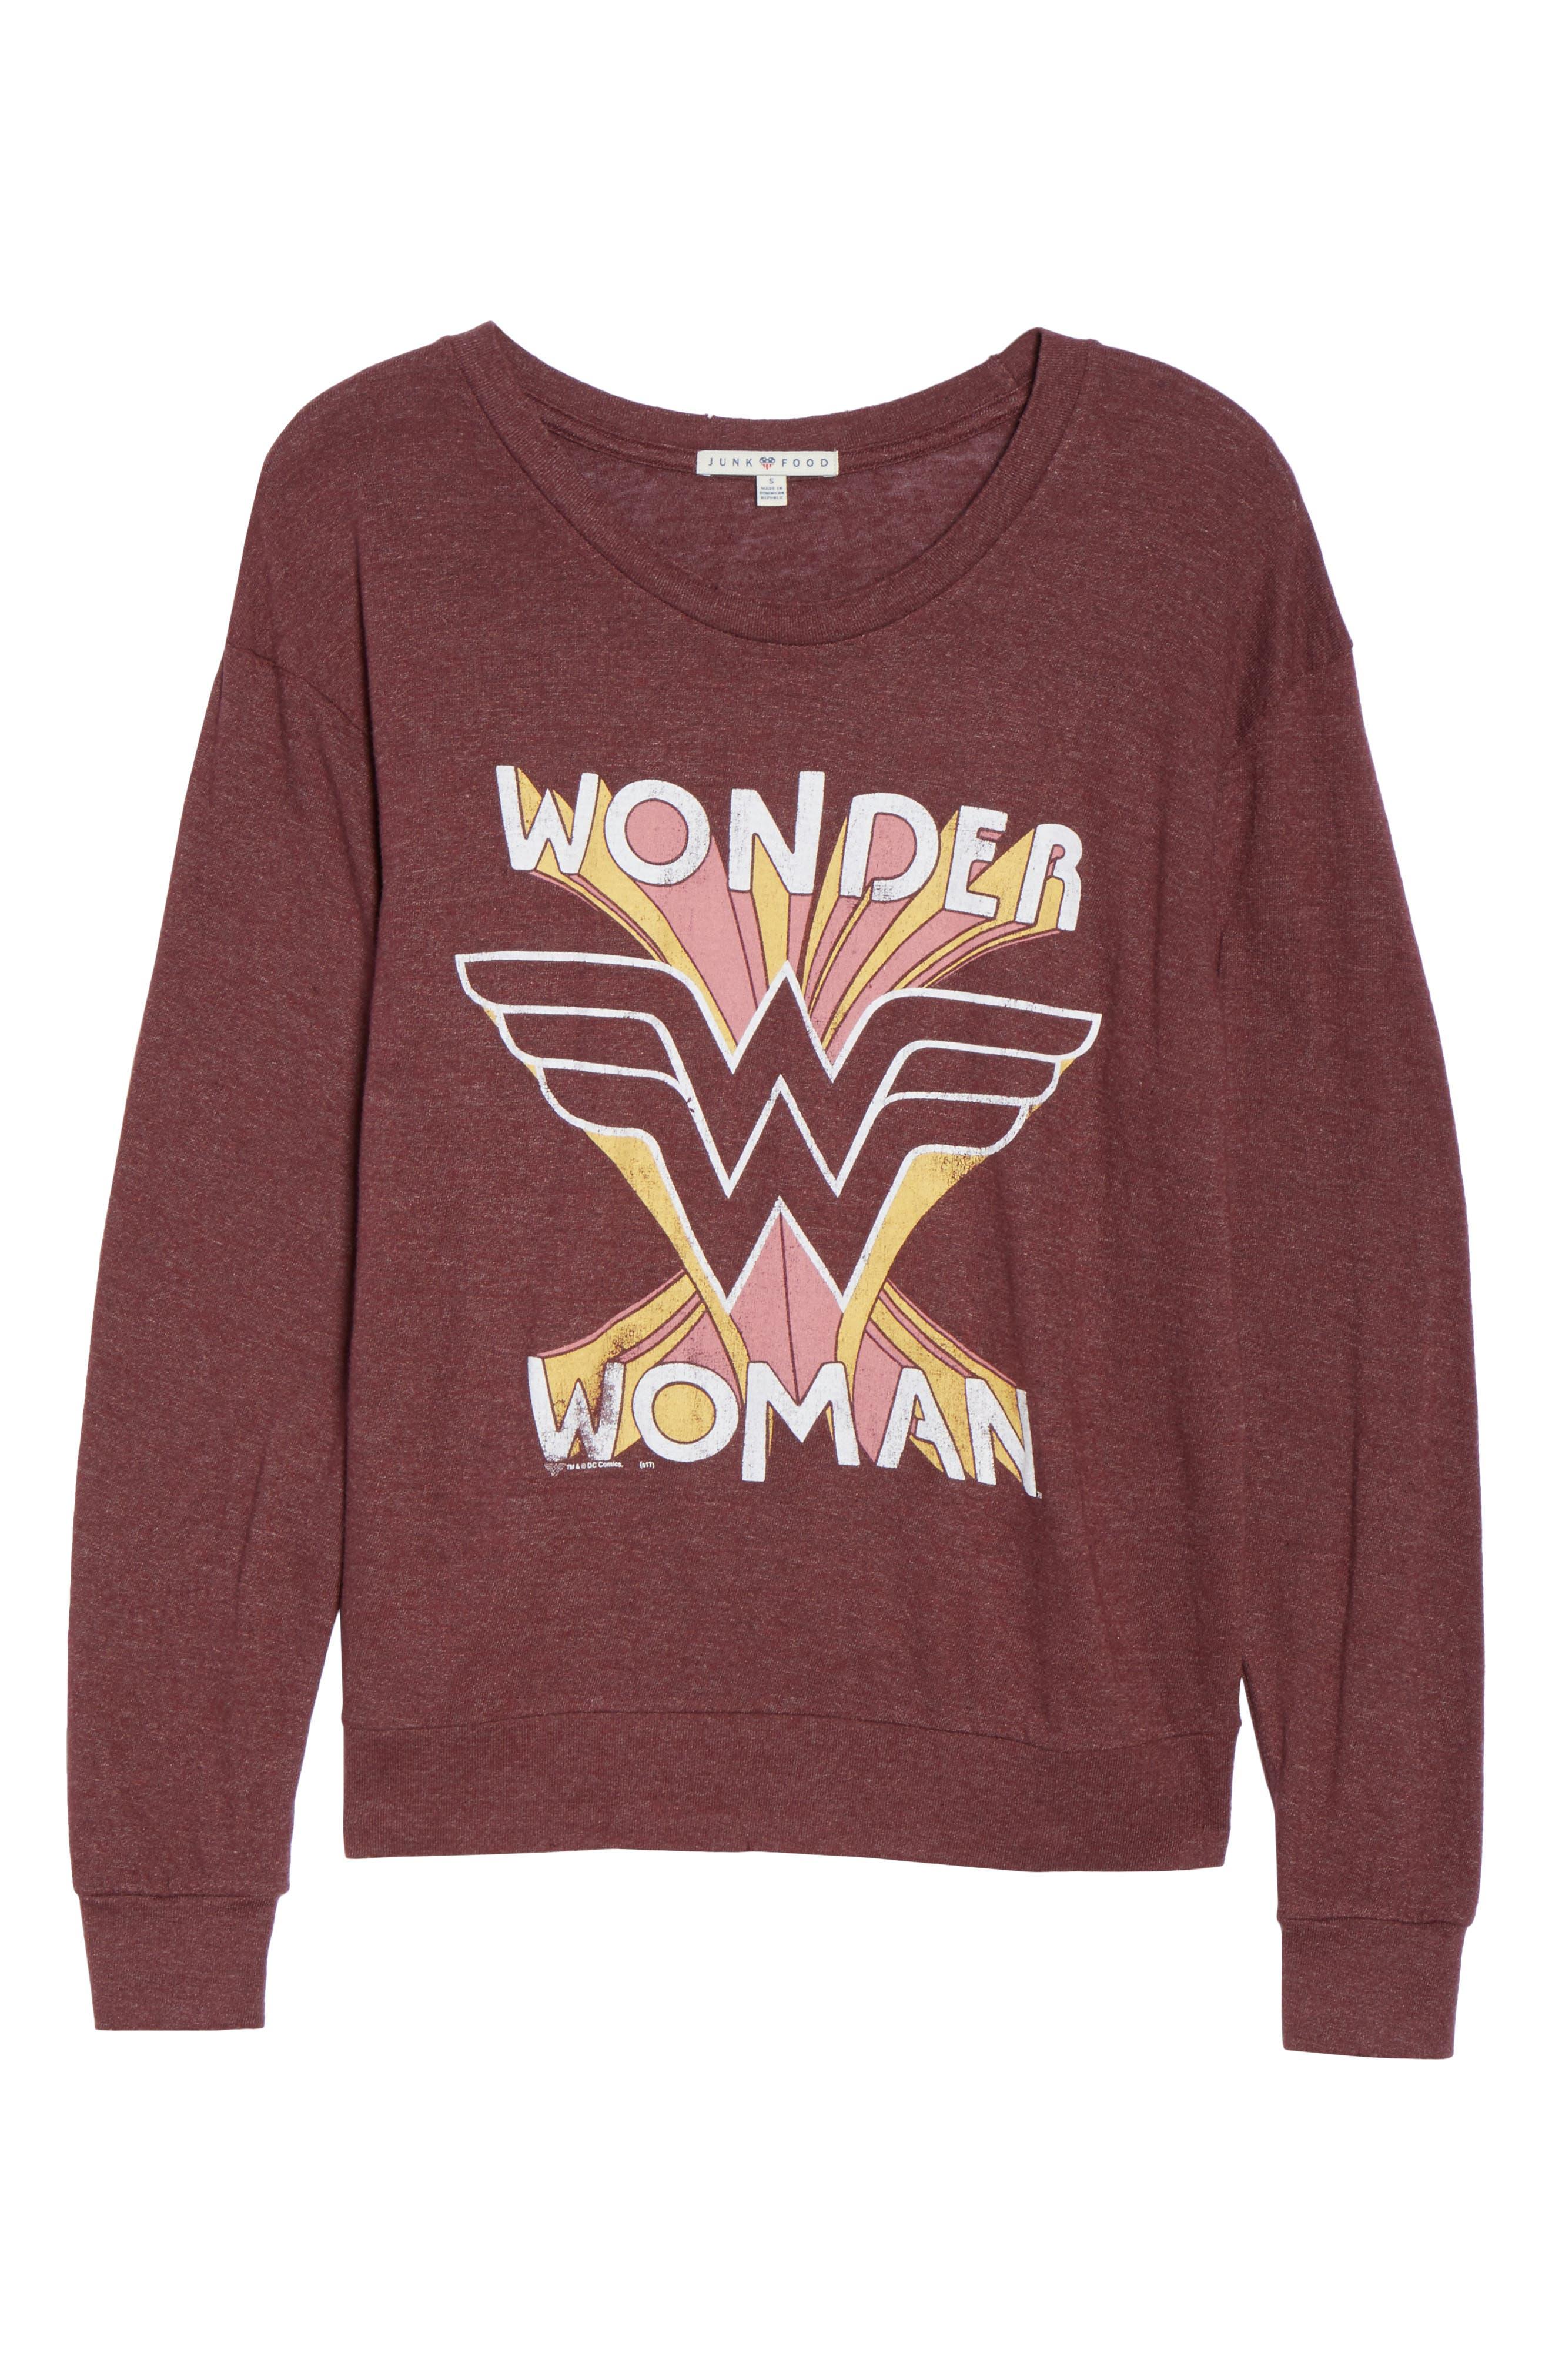 Wonder Woman Sweatshirt,                             Alternate thumbnail 6, color,                             930